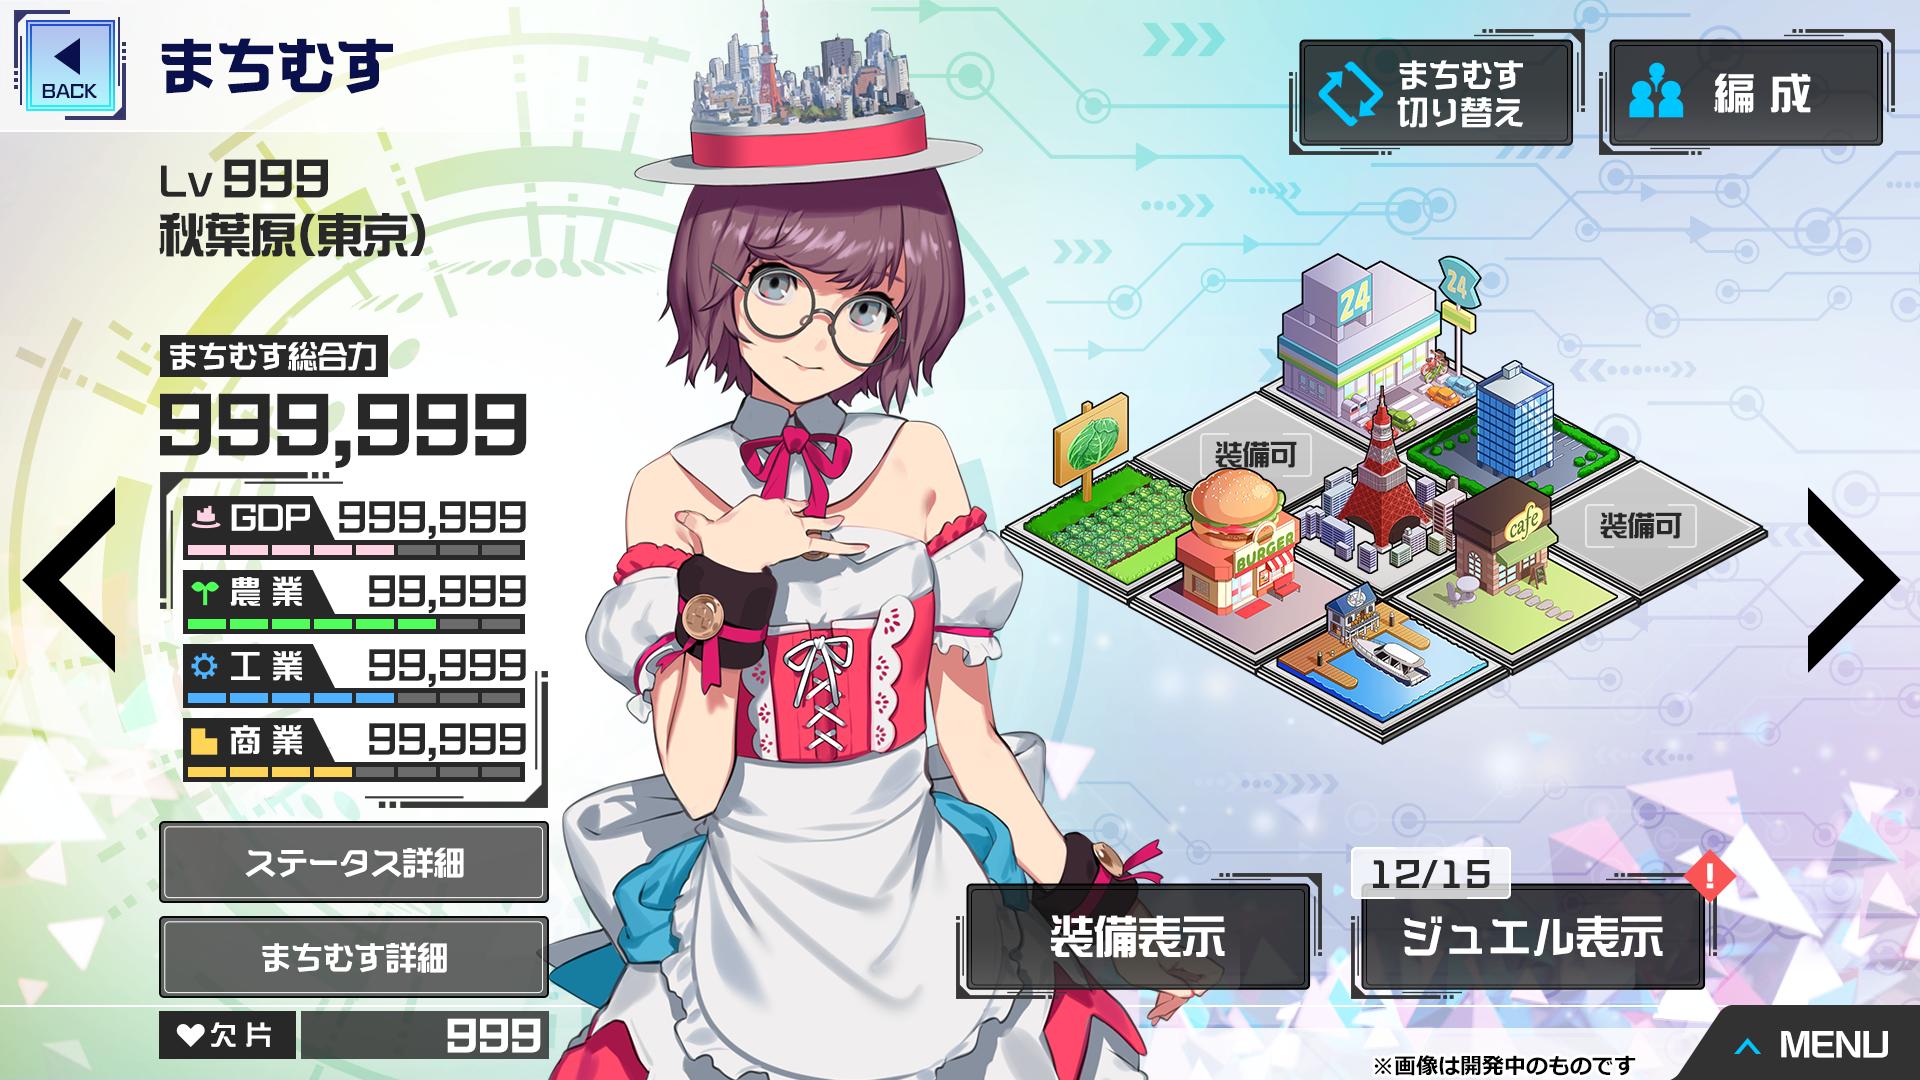 DMM Machimusu Earth Defense Live 2052019 1